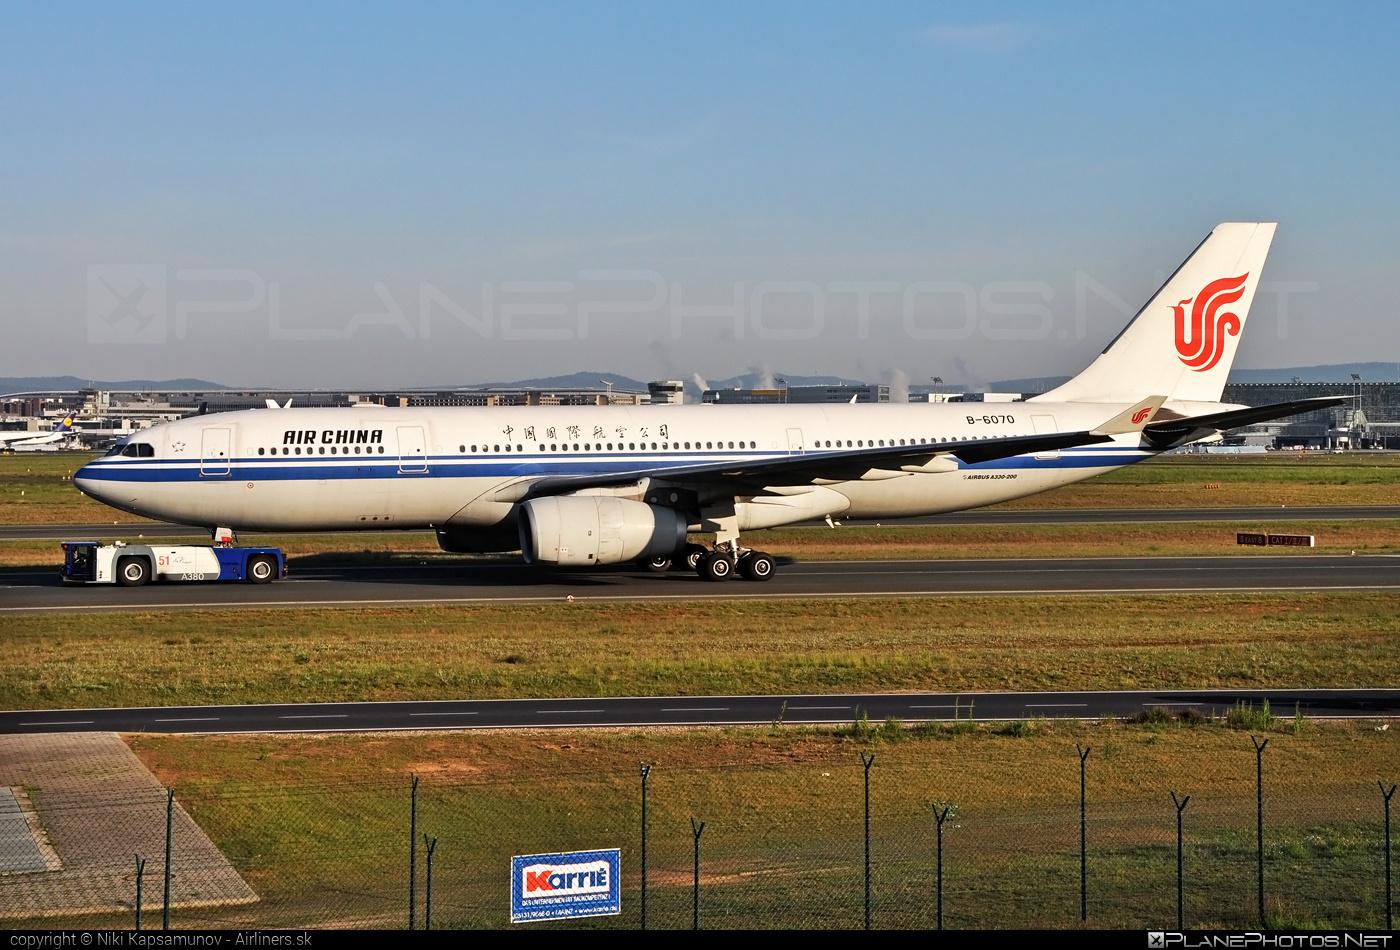 Airbus A330-243 - B-6070 operated by Air China #a330 #a330family #airbus #airbus330 #airchina